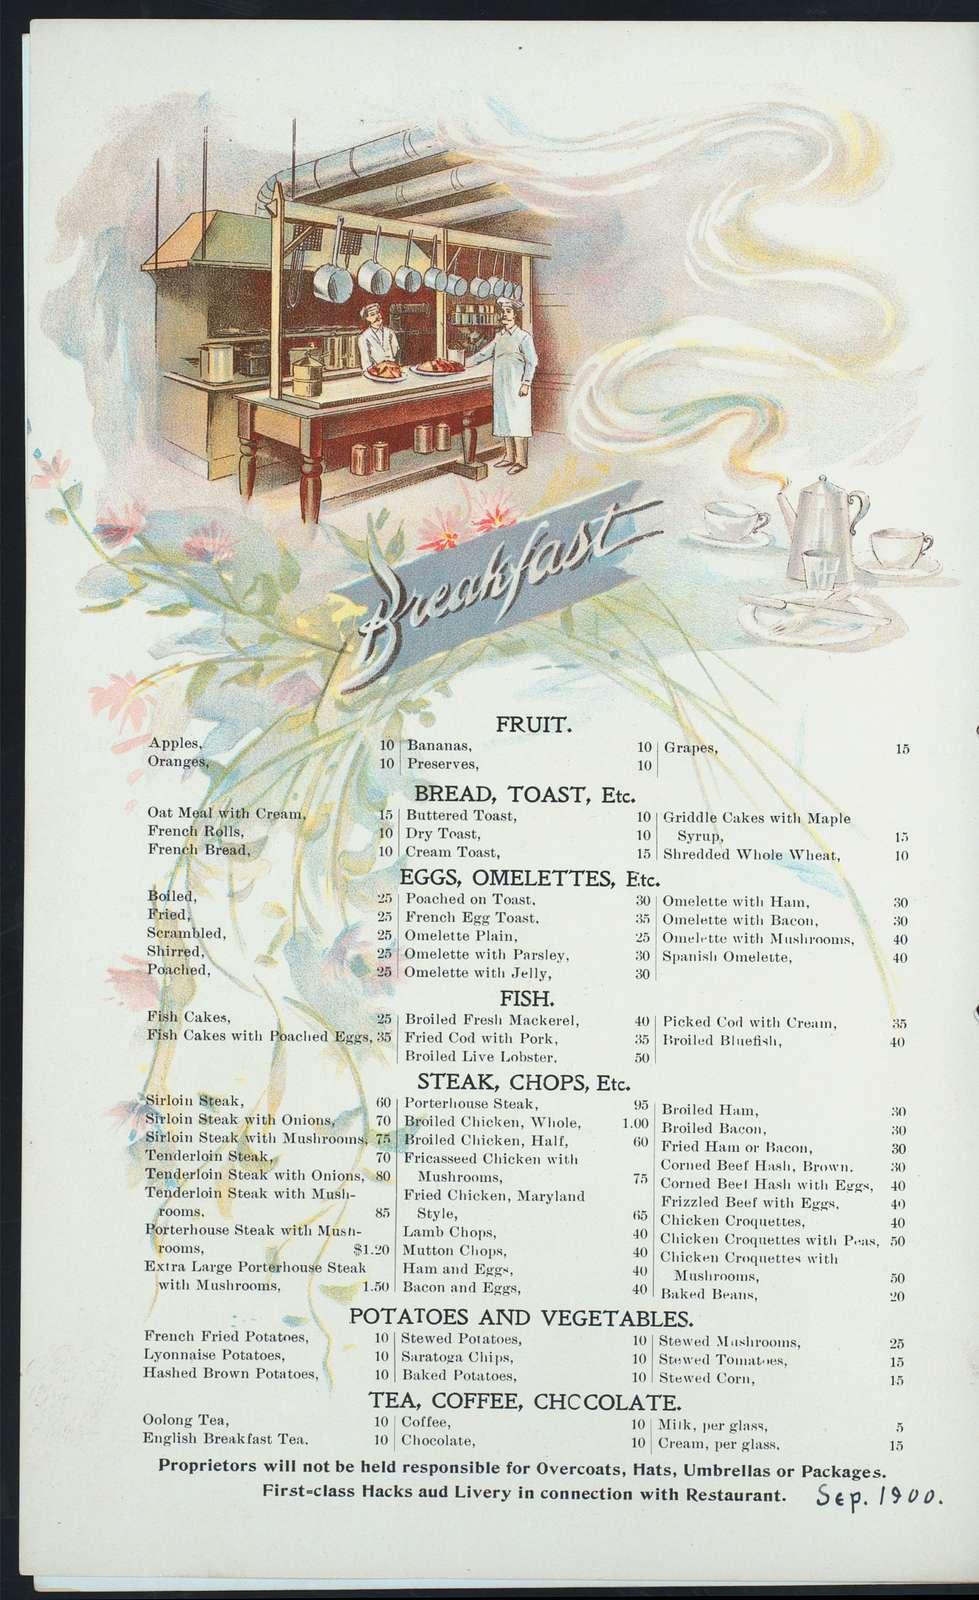 "BREAKFAST,DINNER & SUPPER MENUS [held by] ELMER WOODBURY HOTEL & RESTAURANT COMPANY [at] ""UNION STATION, PORTLAND,ME."" (HOTEL & REST;)"